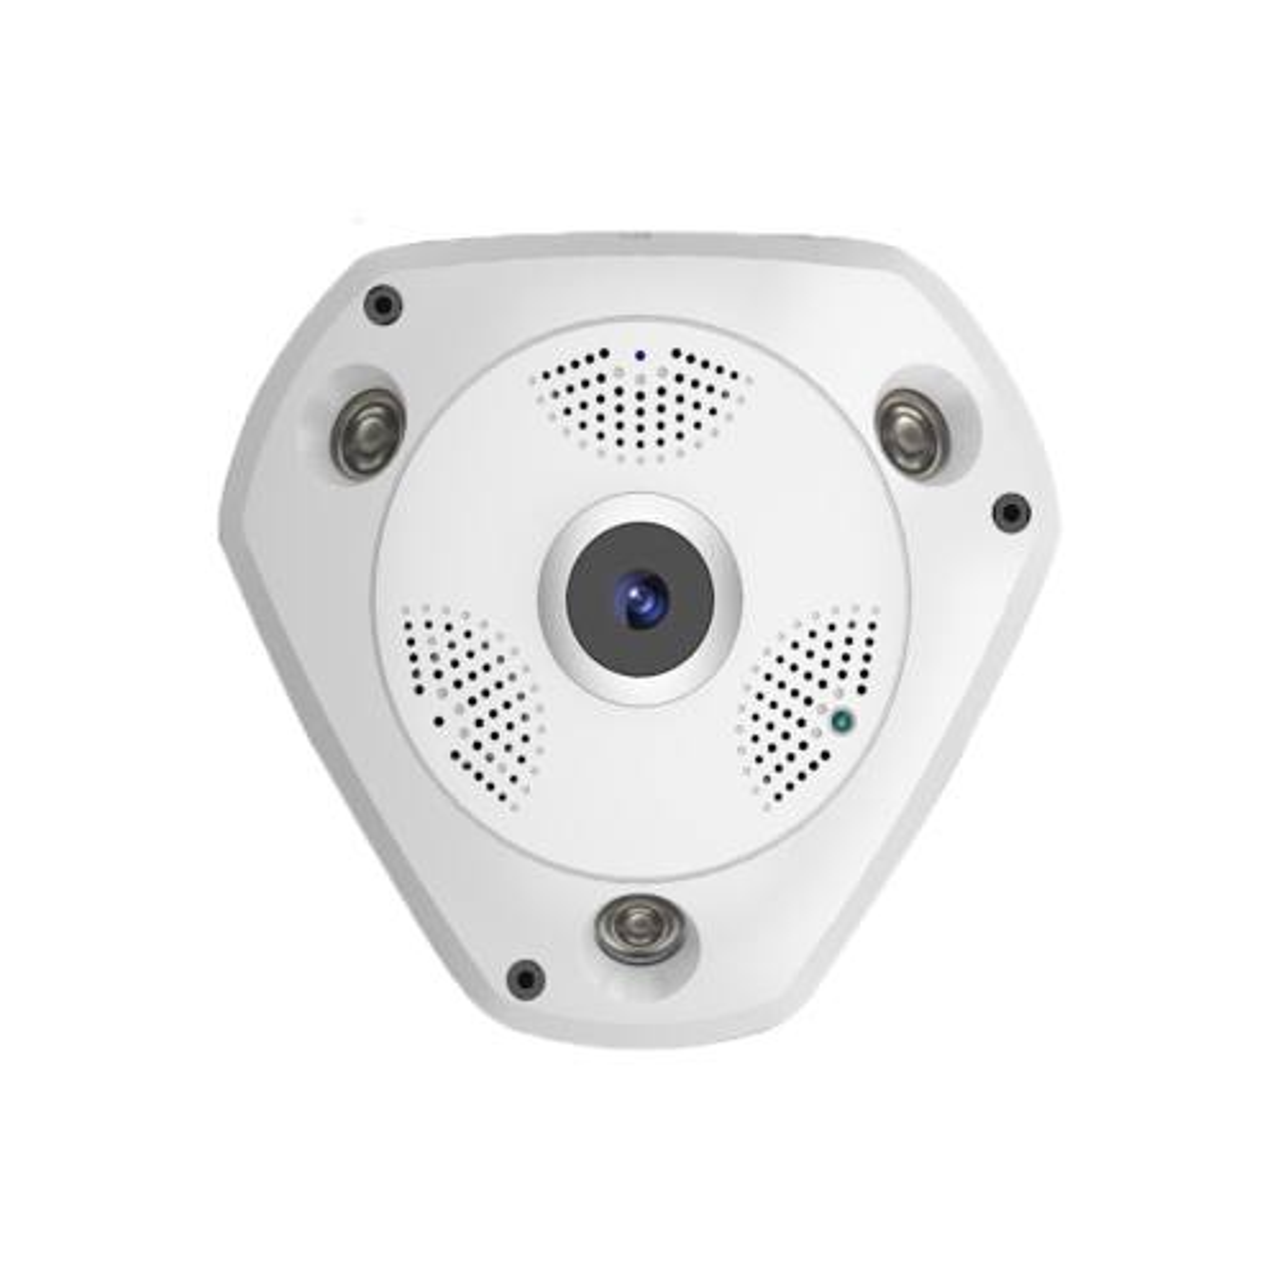 دوربین بی سیم تحت شبکه مدل JA-P2